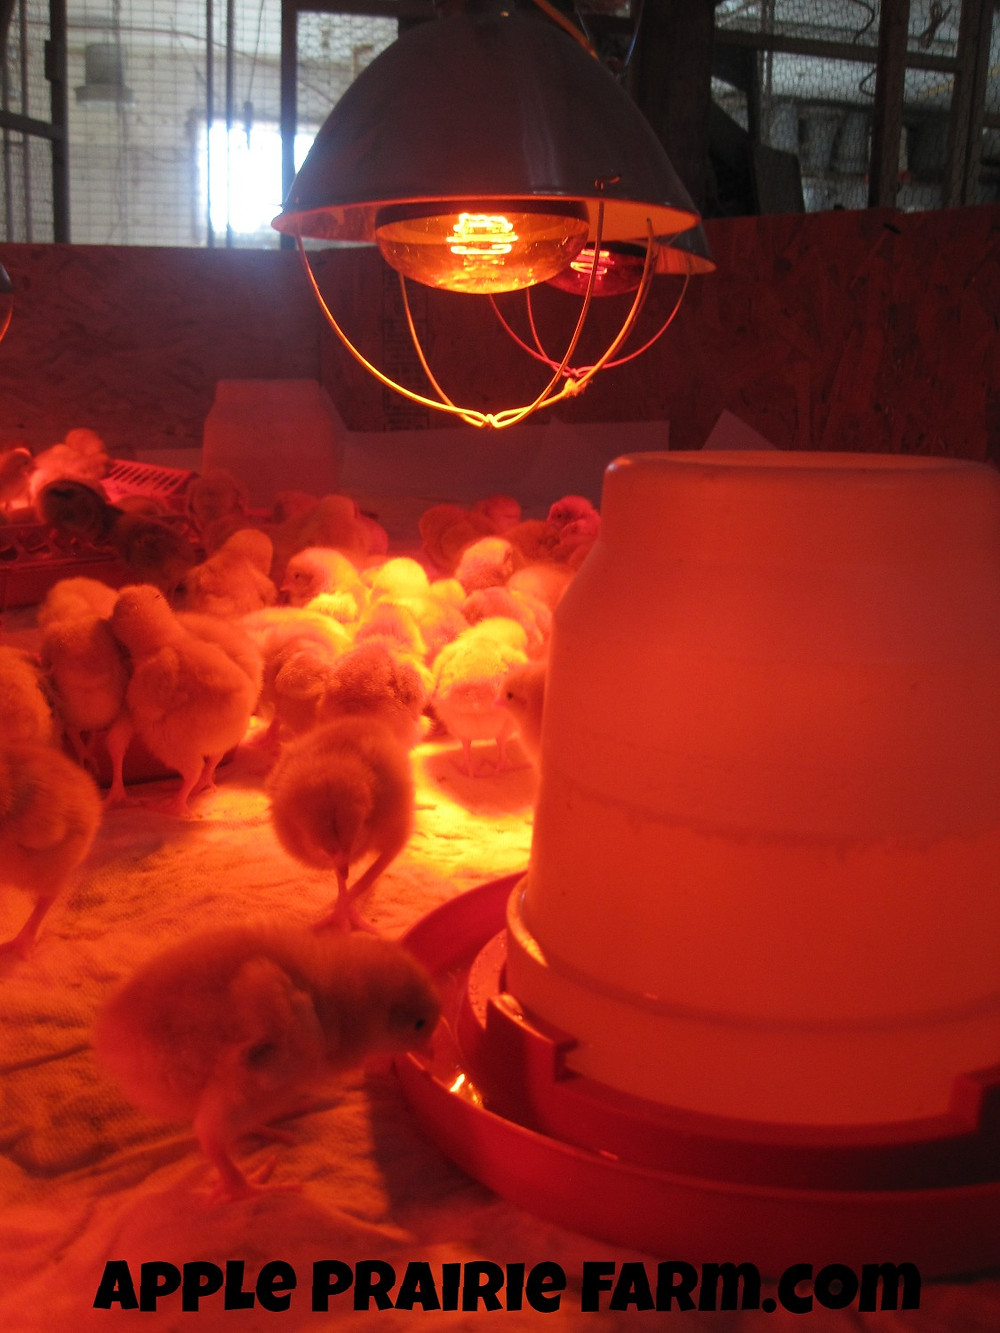 Apple Prairie Farm, How to brood chicks, Homesteading